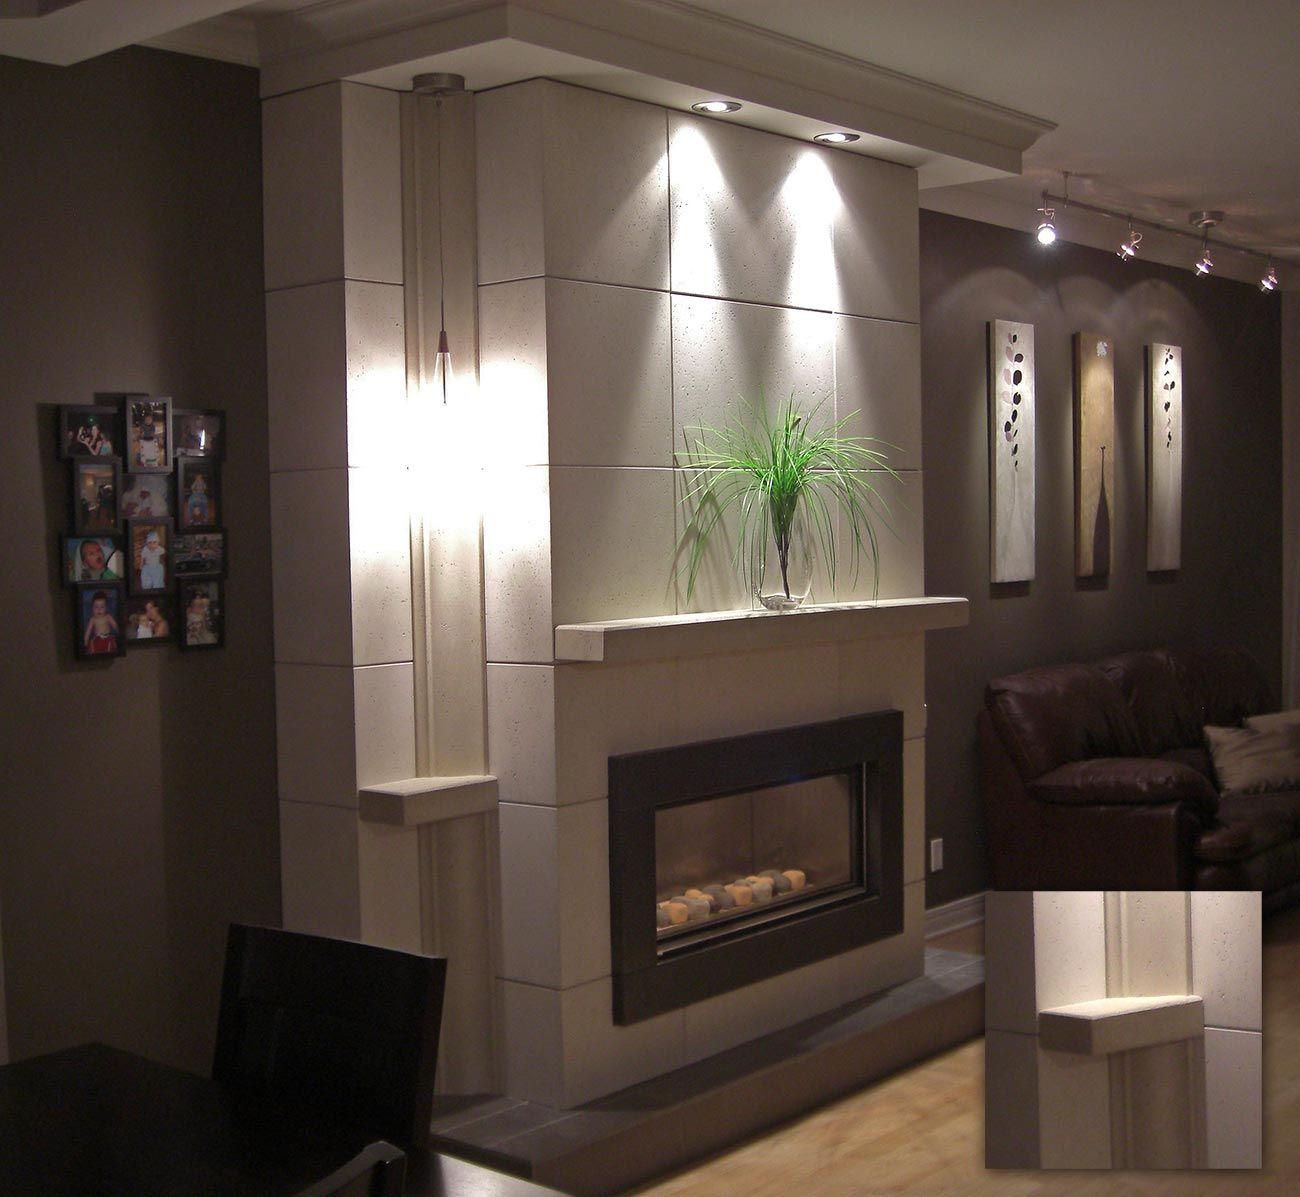 Image result for mur tv et foyer new house pinterest d co salon mur tv and salon - Decoration foyer salon ...